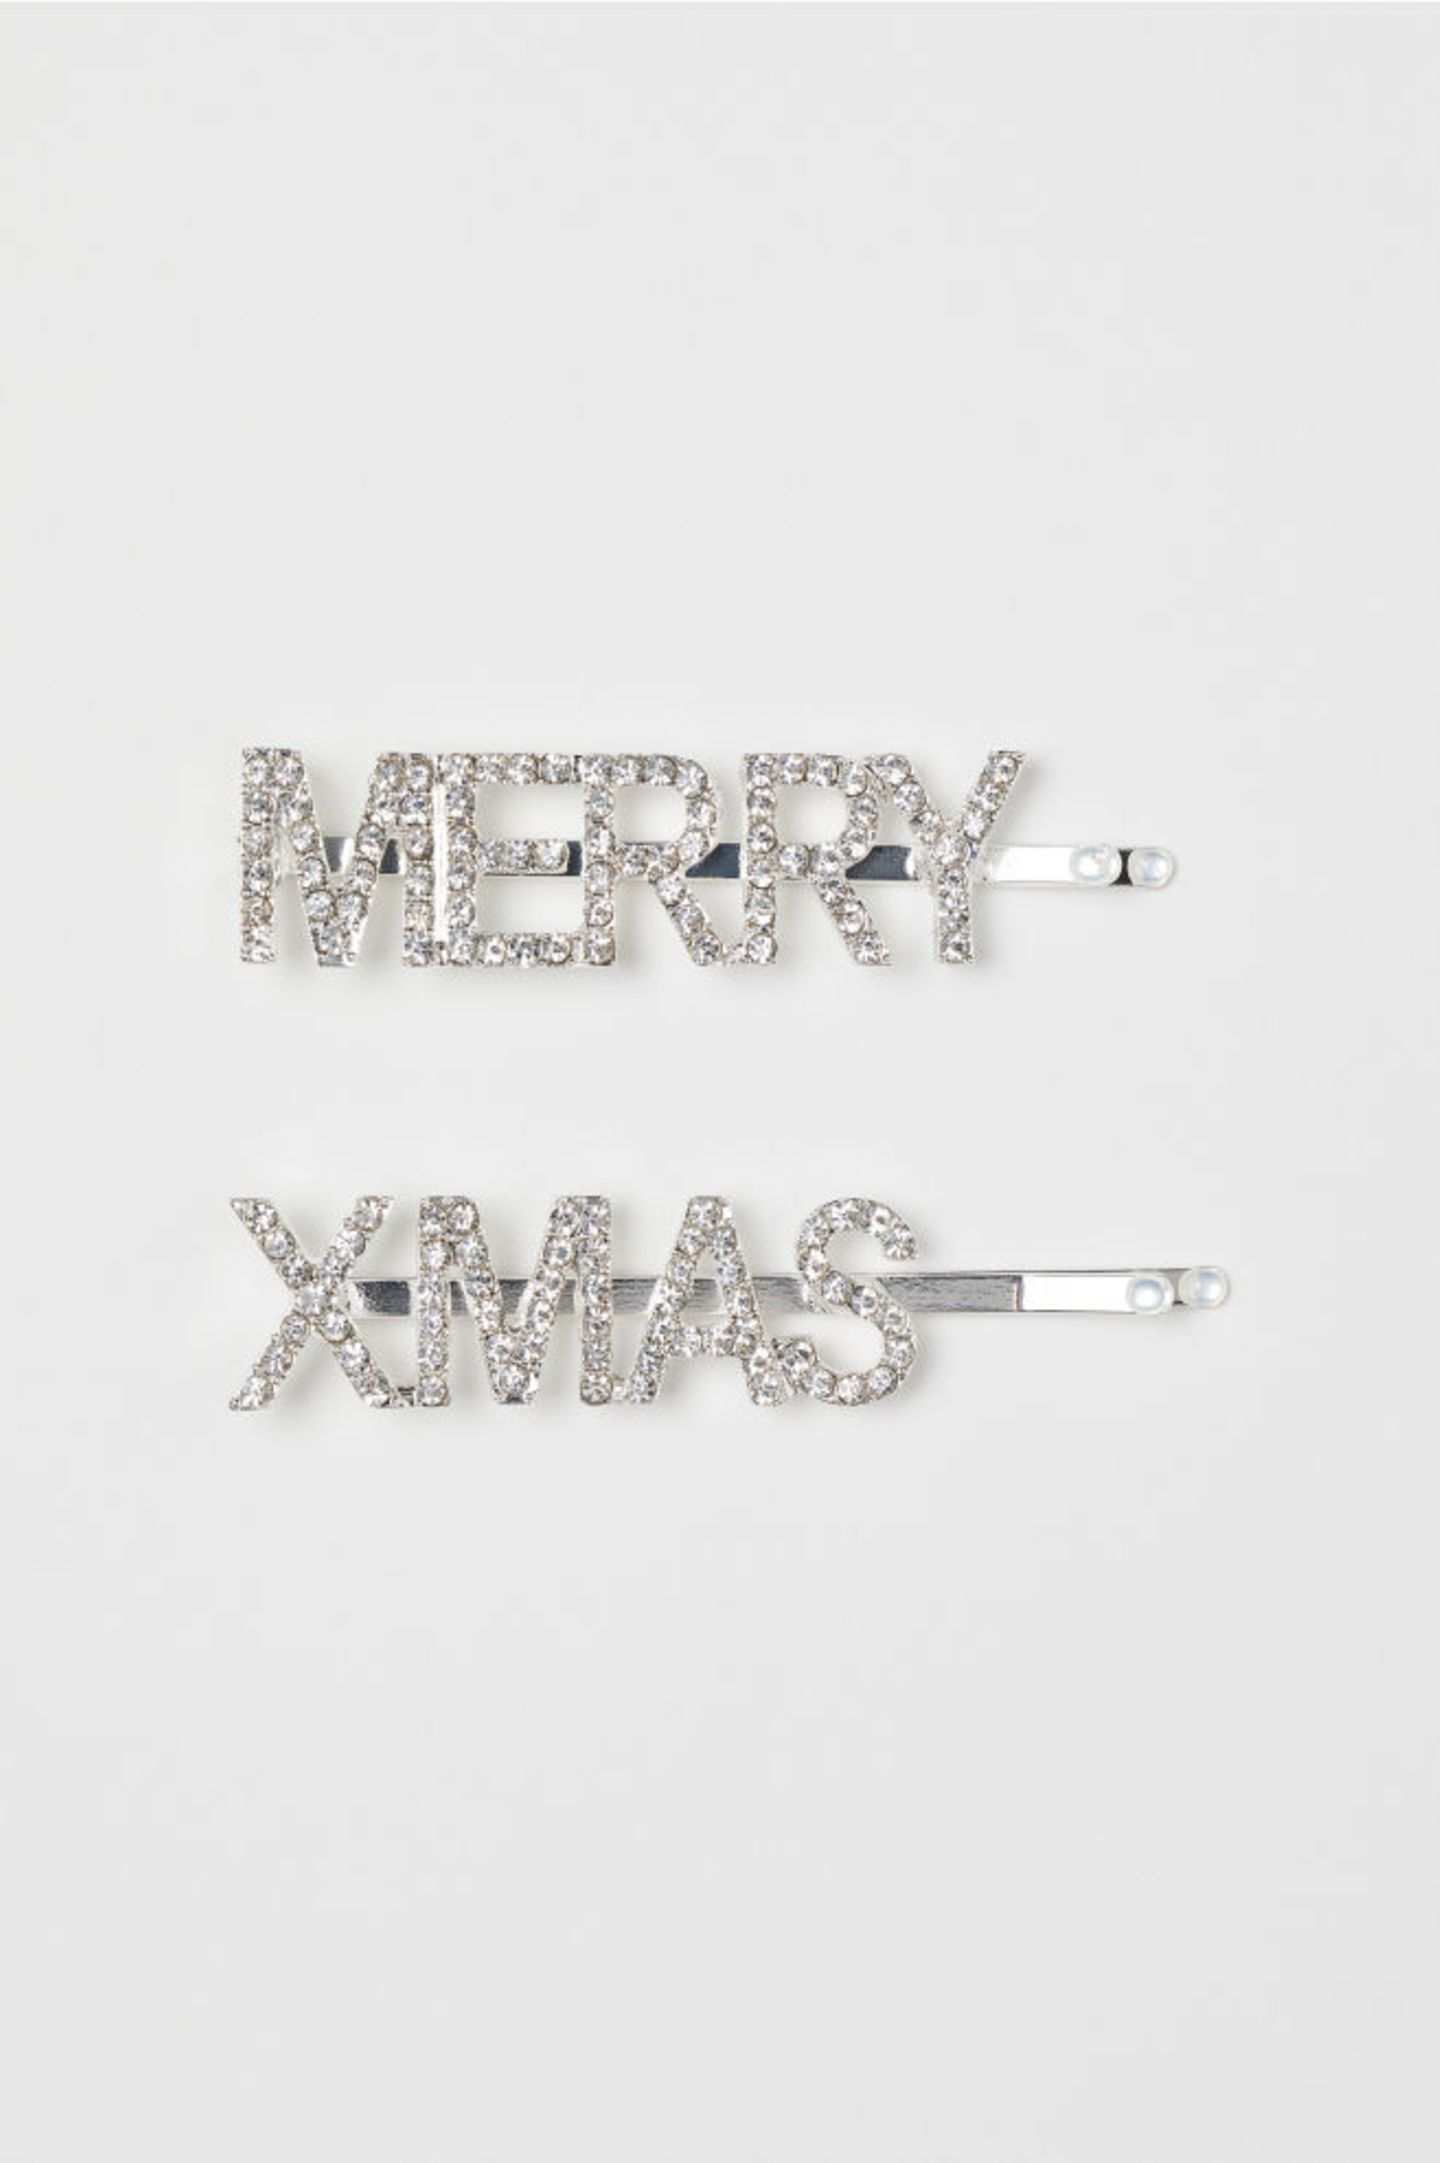 Haarspange mit Merry X-Mas Print